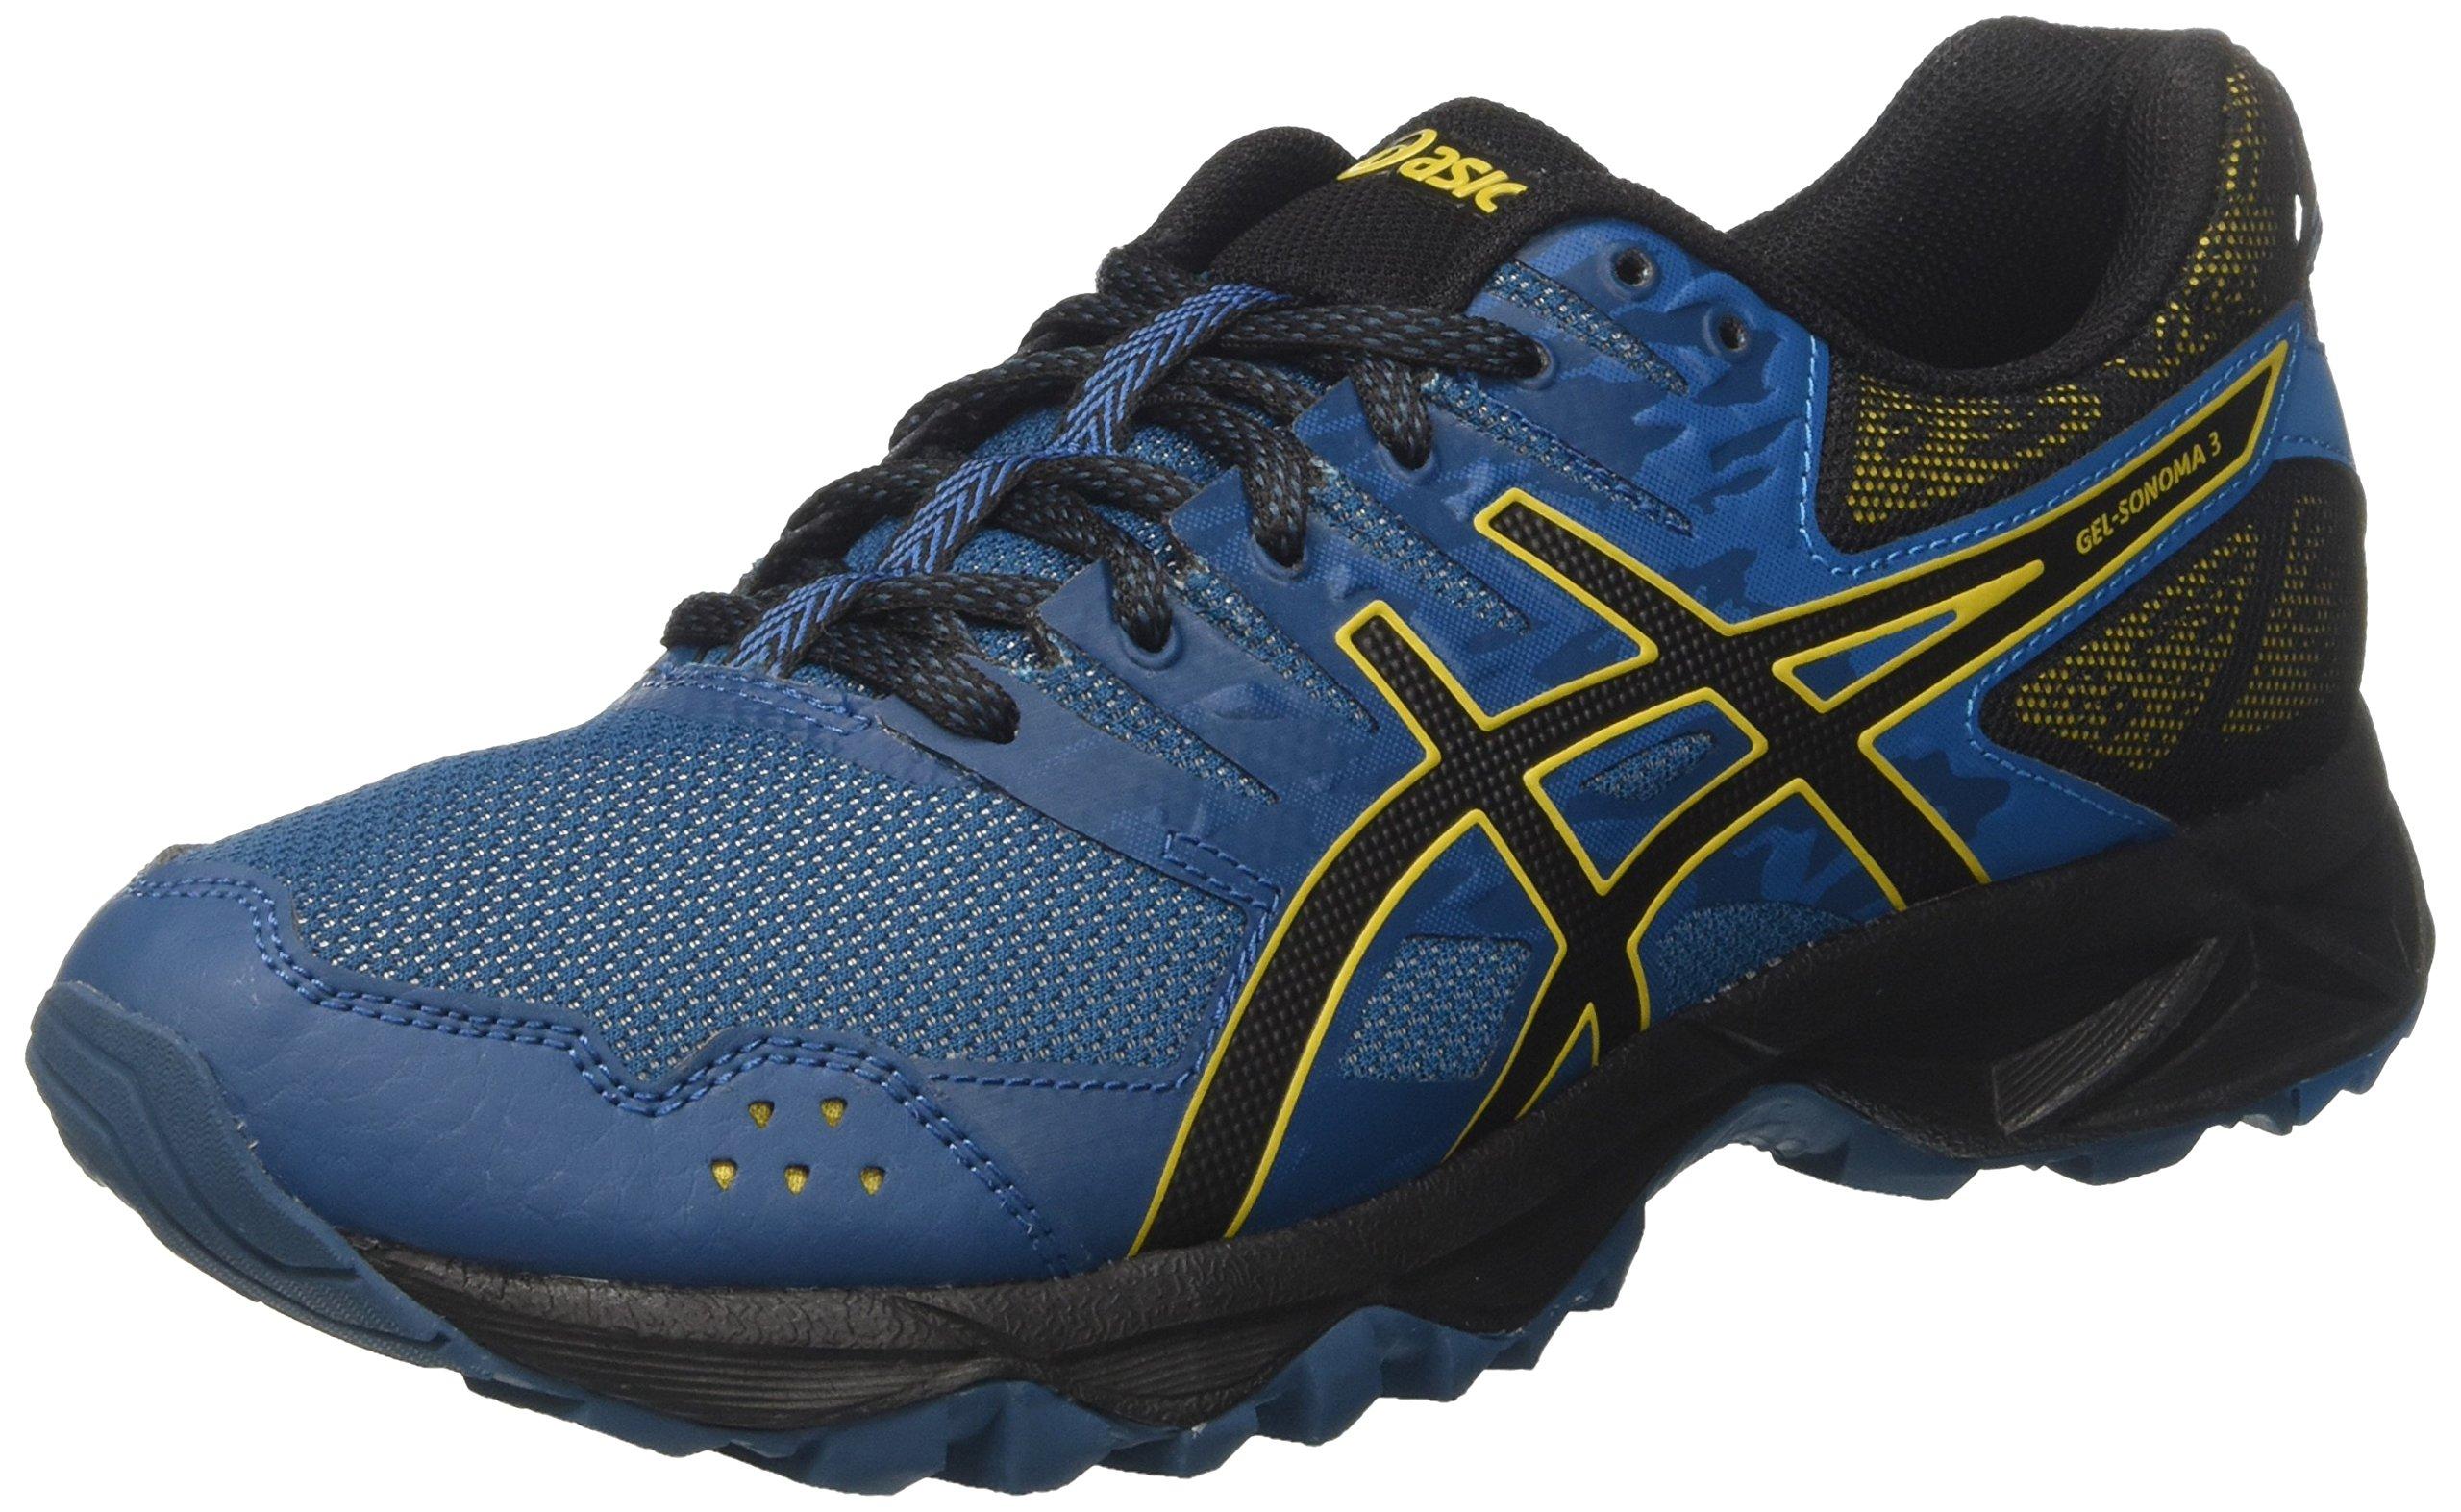 Asics Gel-Kayano 25 Black Neon Lime Men Running Shoes Sneakers 1011A019-001